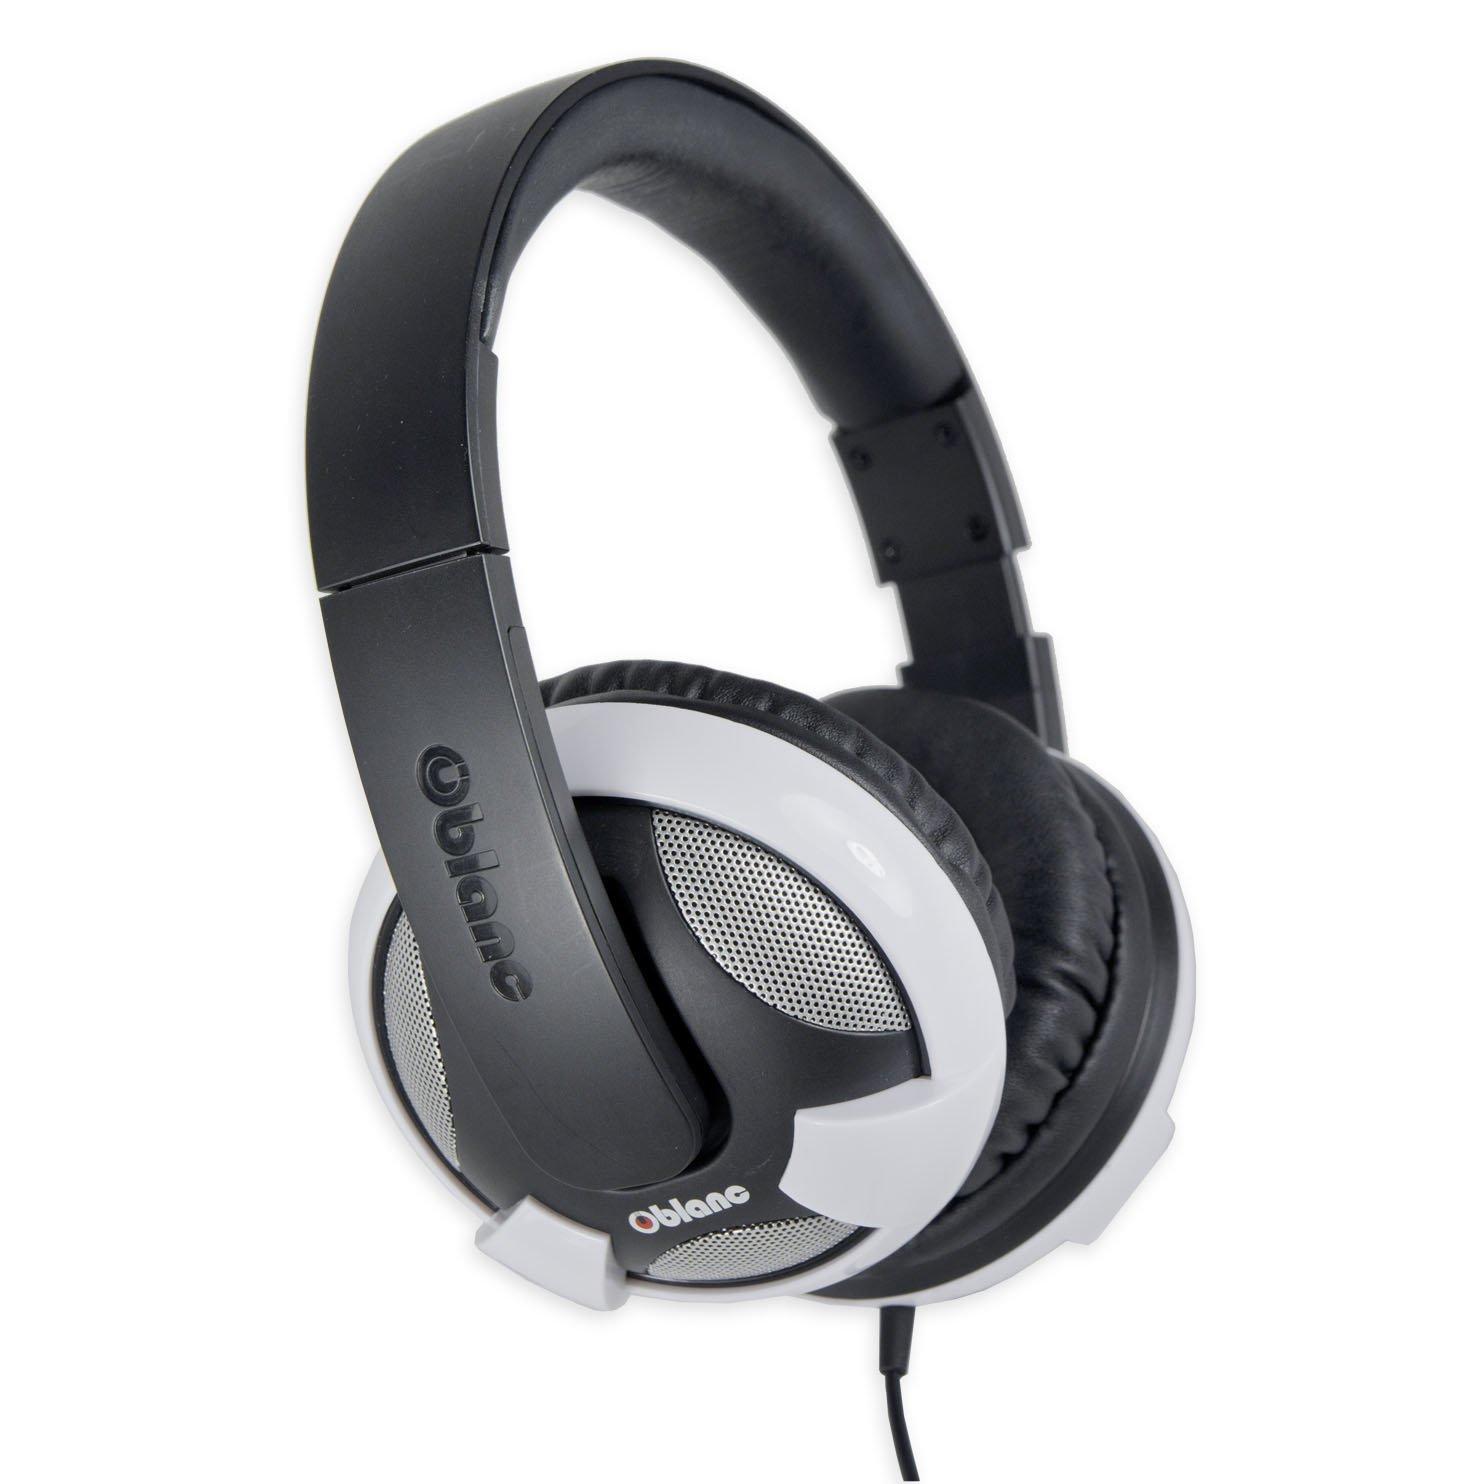 Syba Headphone Amplifier Microphone OG AUD63052